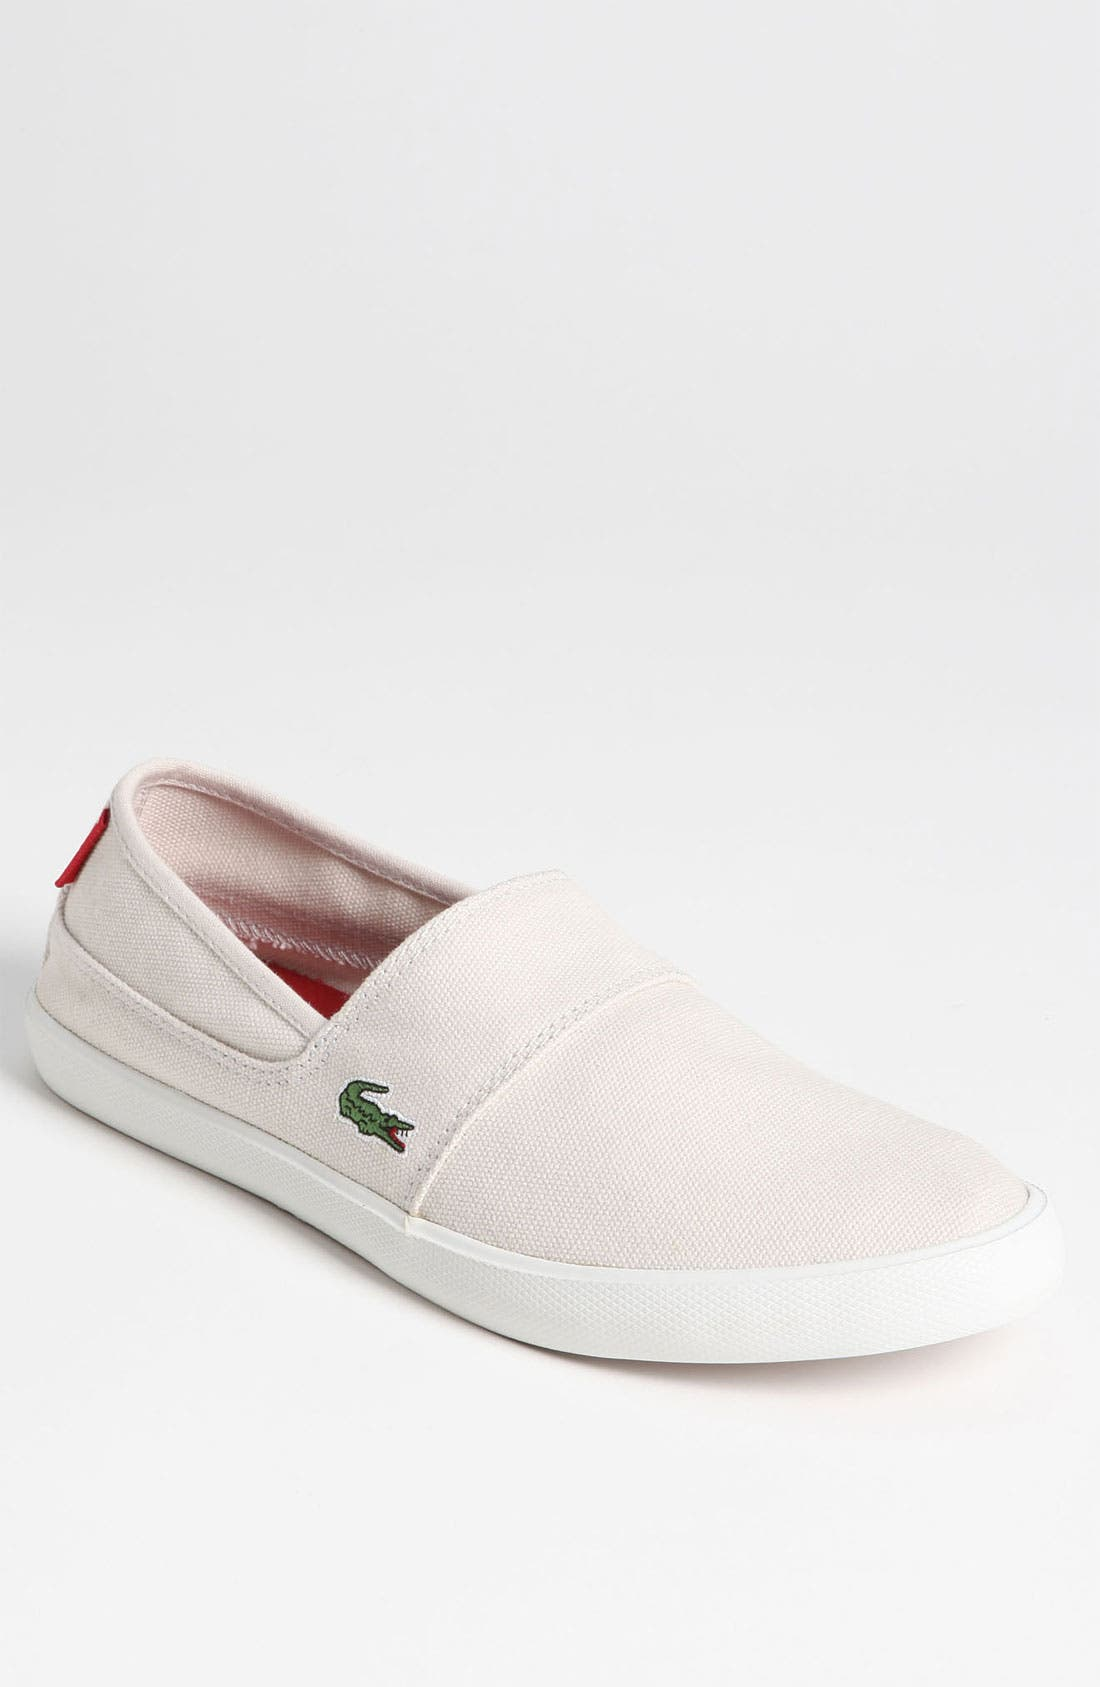 Main Image - Lacoste 'Clemente CI' Slip-On Sneaker